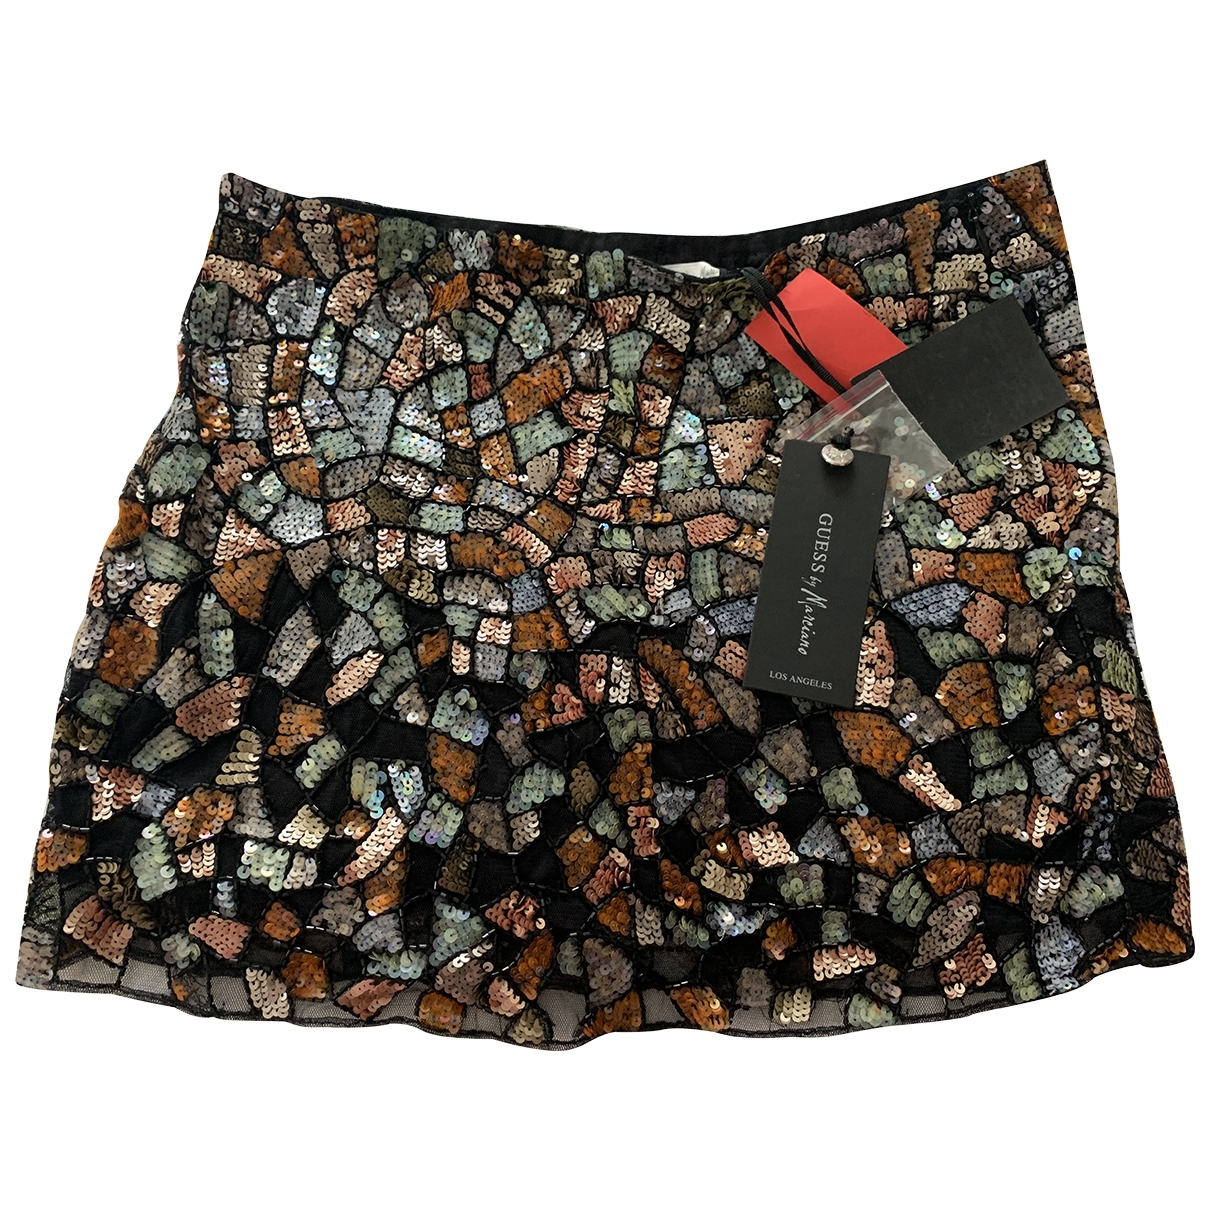 Guess \N Multicolour skirt for Women 40 IT